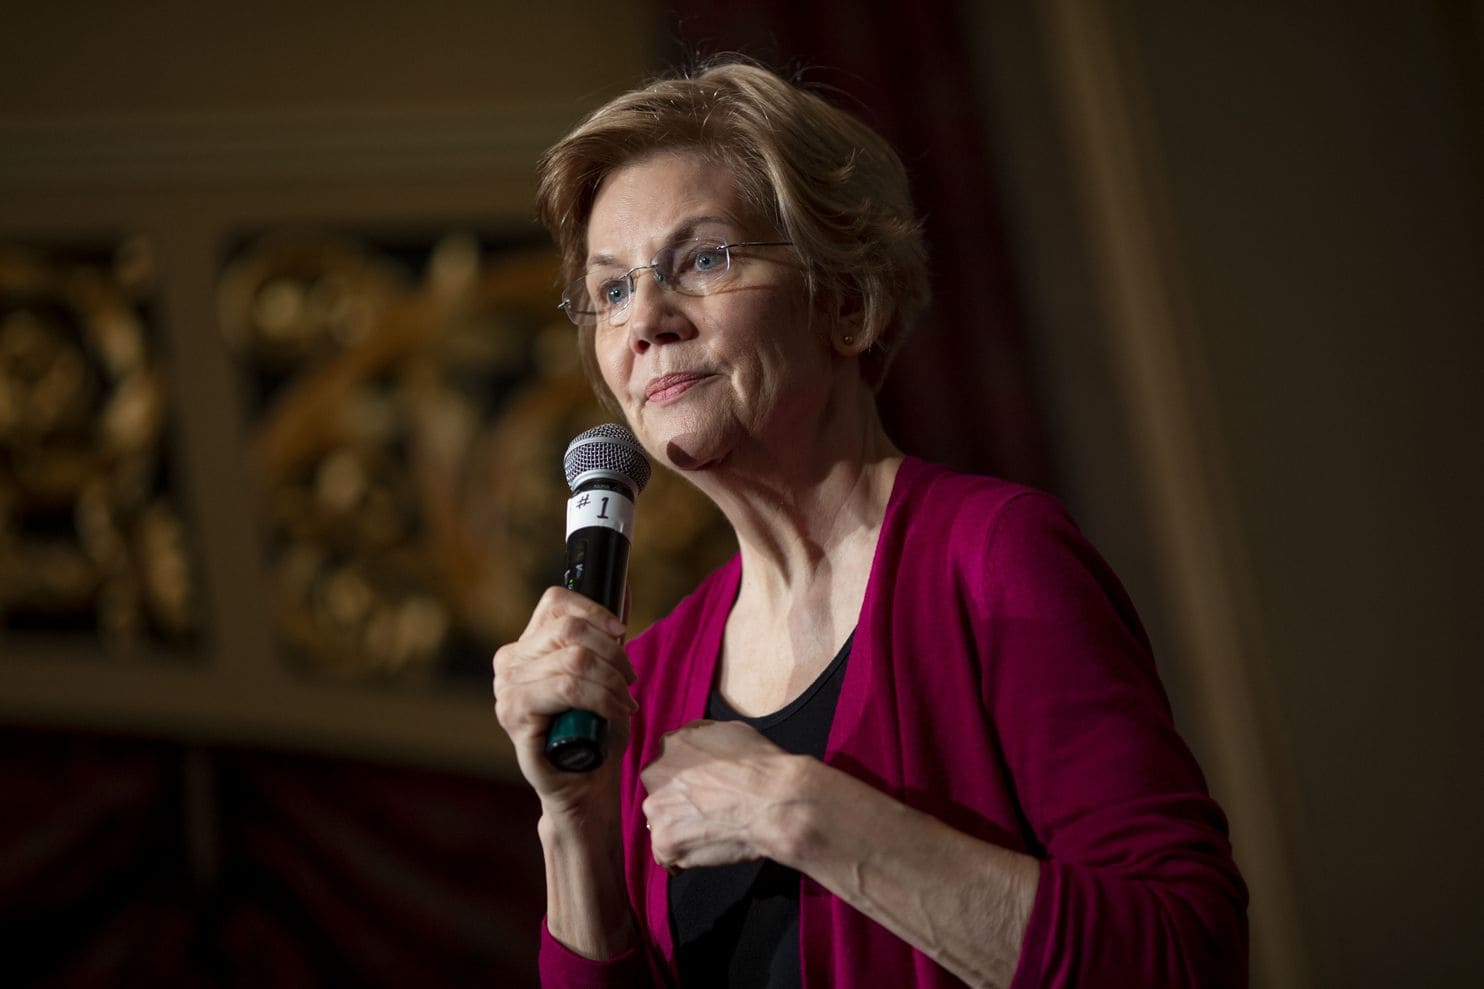 Elizabeth Warren, Politician and Academic